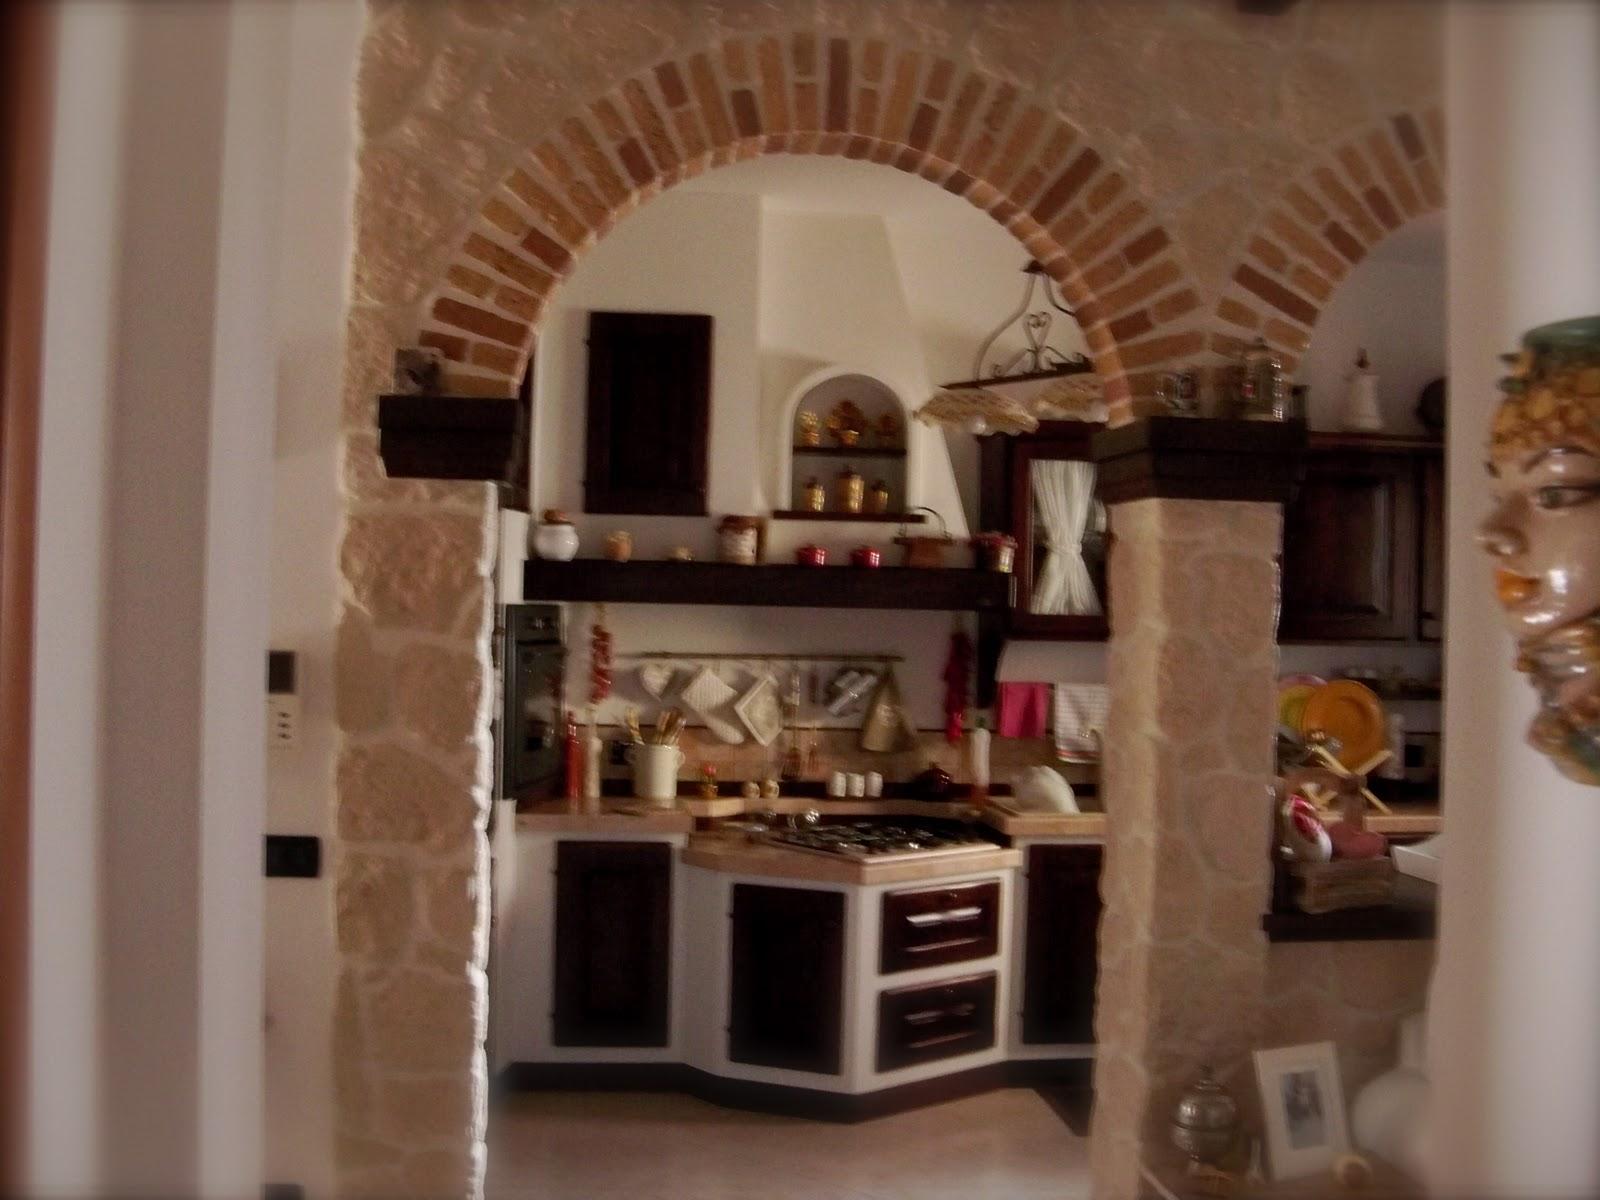 Cucine Usate Palermo - Design Per La Casa Moderna - Ltay.net